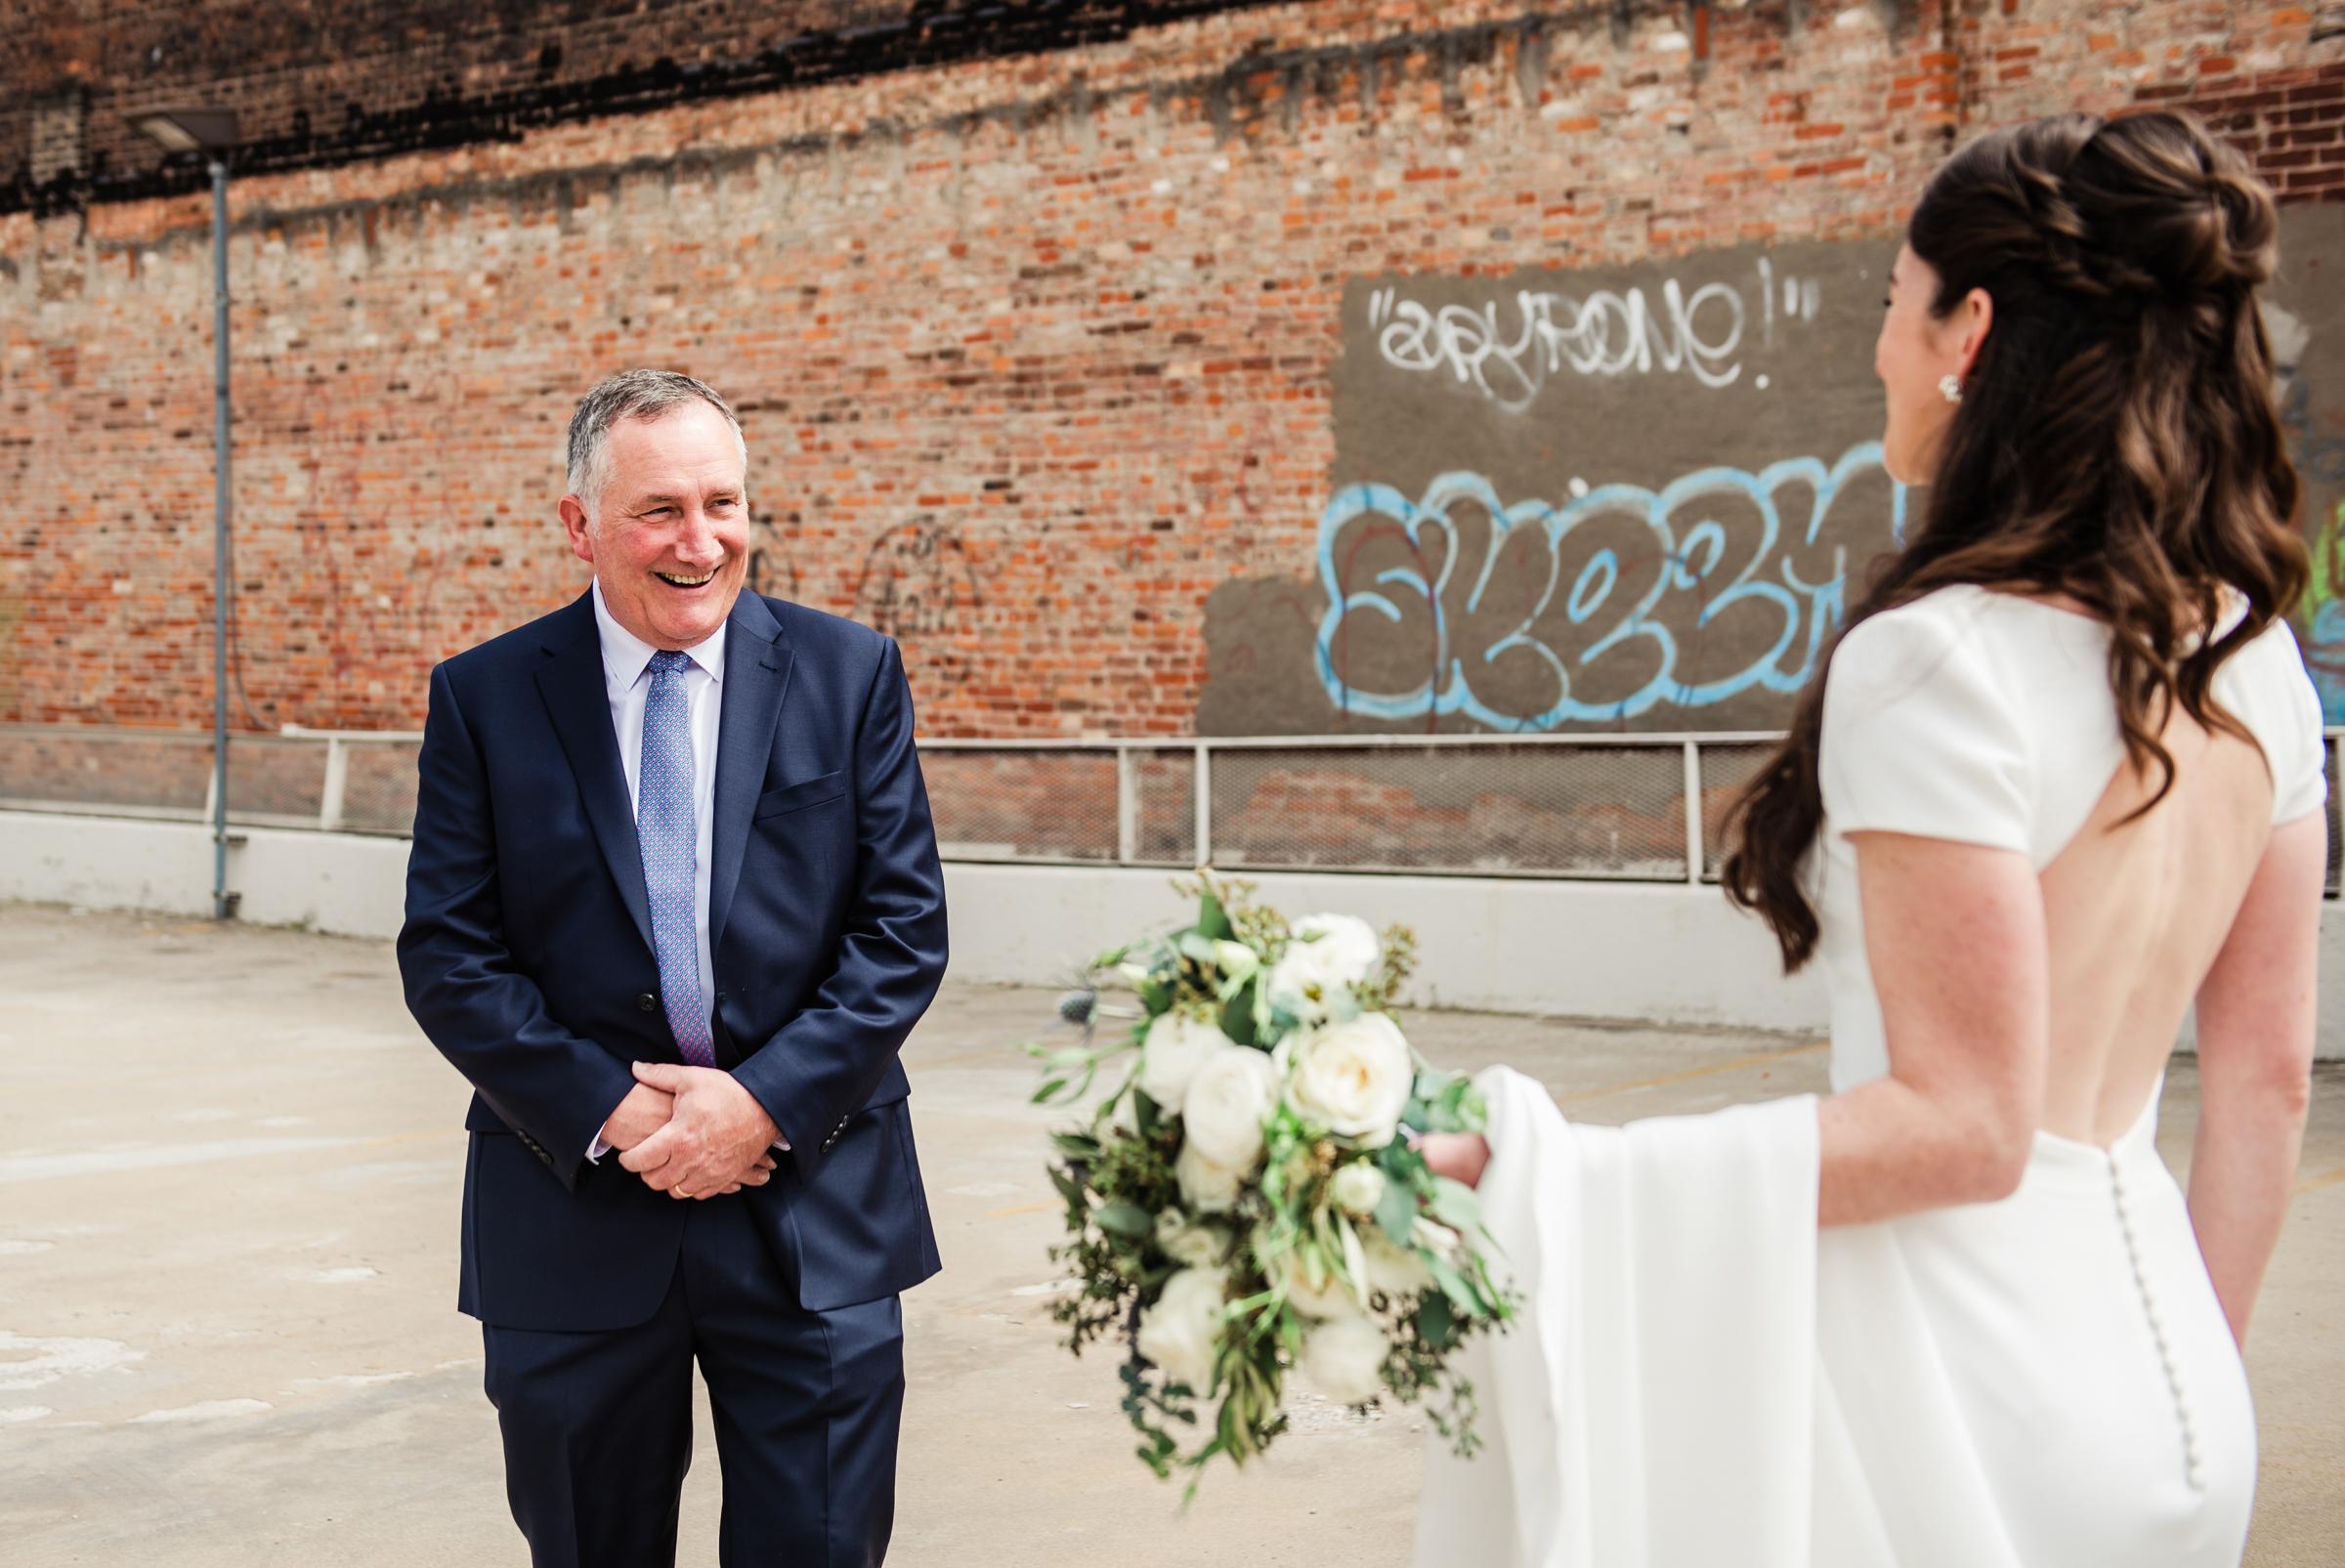 SKY_Armory_Syracuse_Wedding_JILL_STUDIO_Rochester_NY_Photographer_DSC_5324.jpg